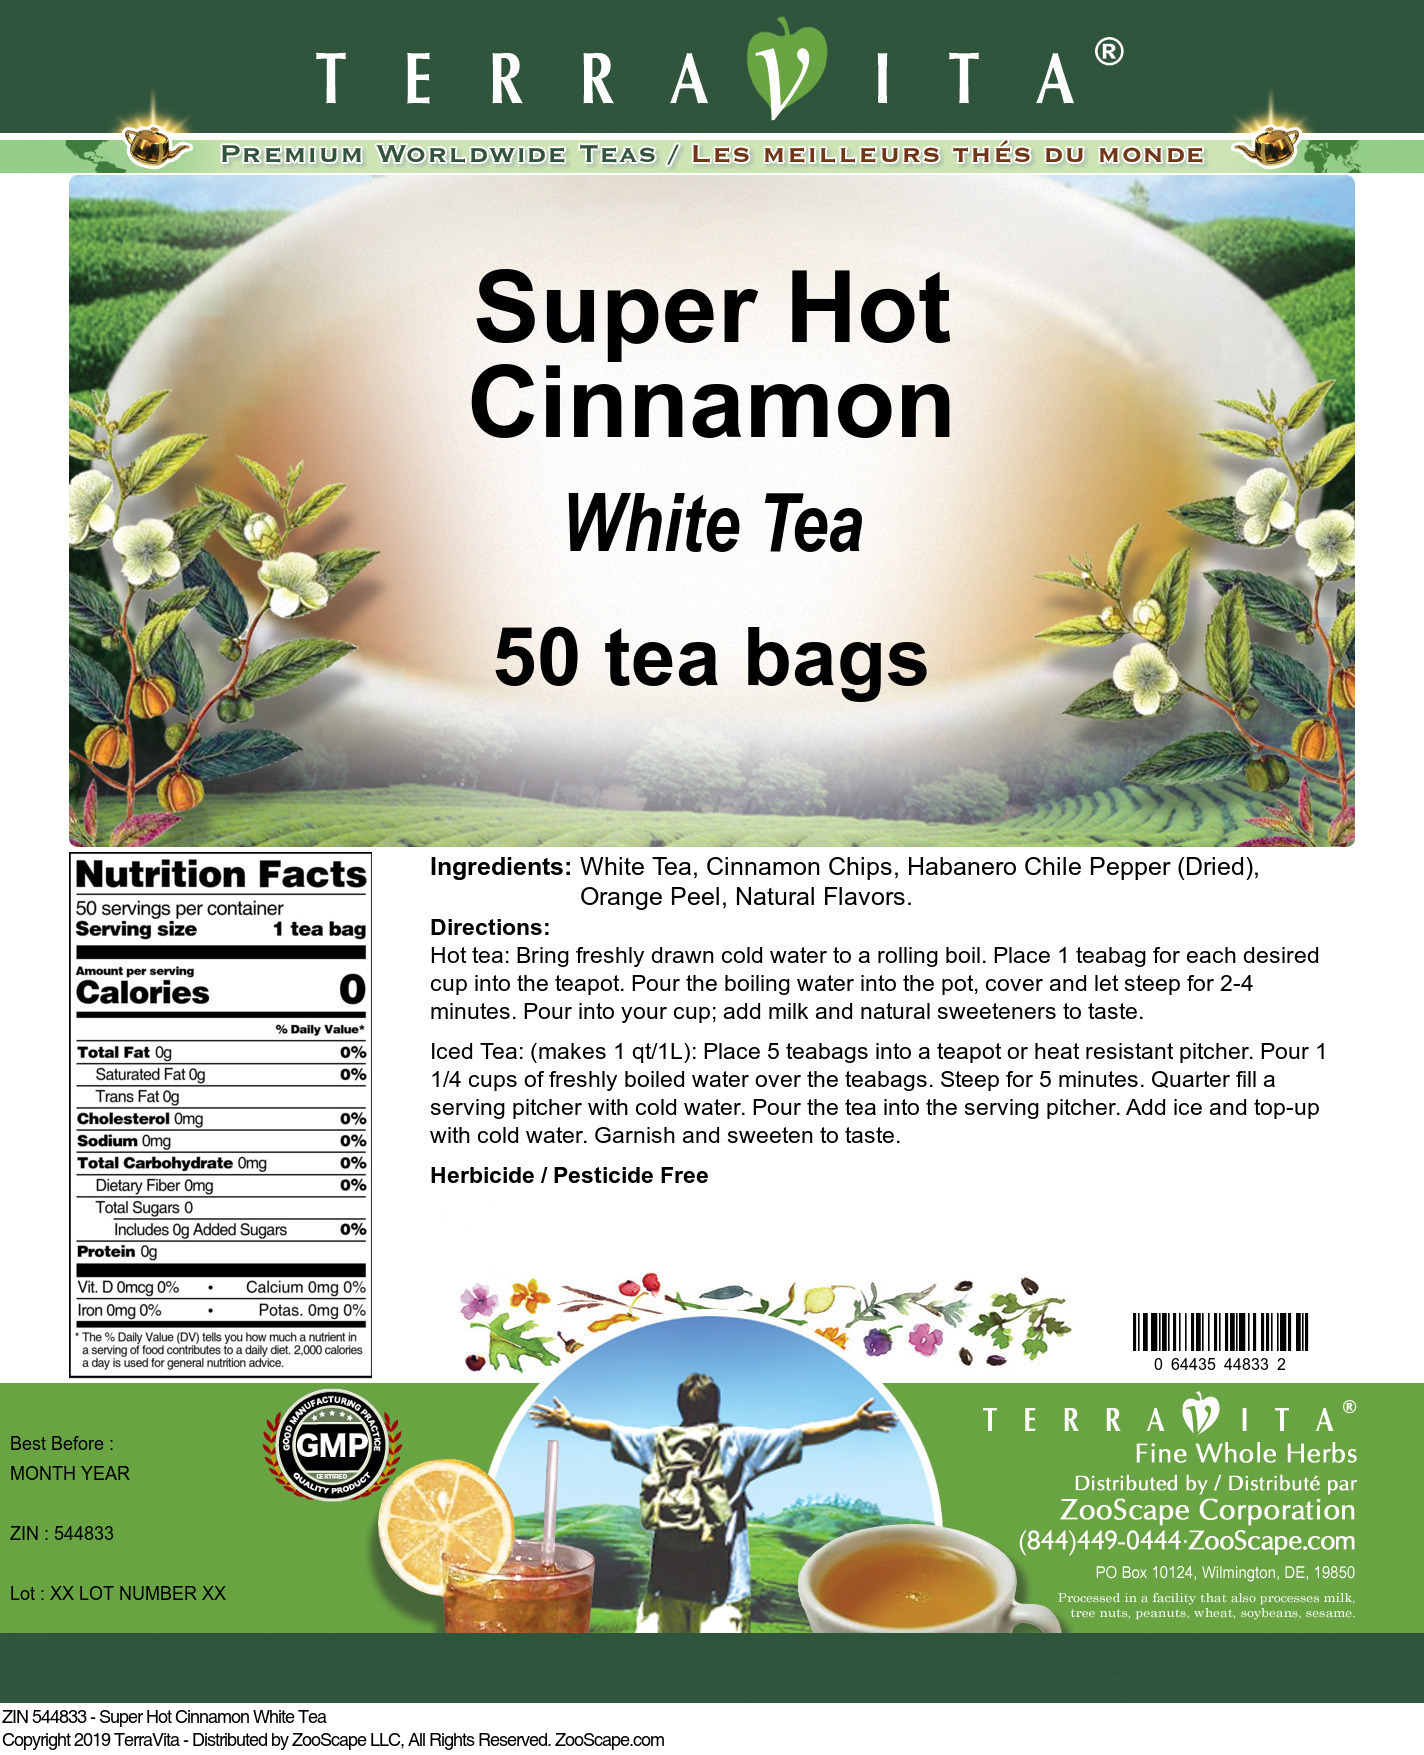 Super Hot Cinnamon White Tea